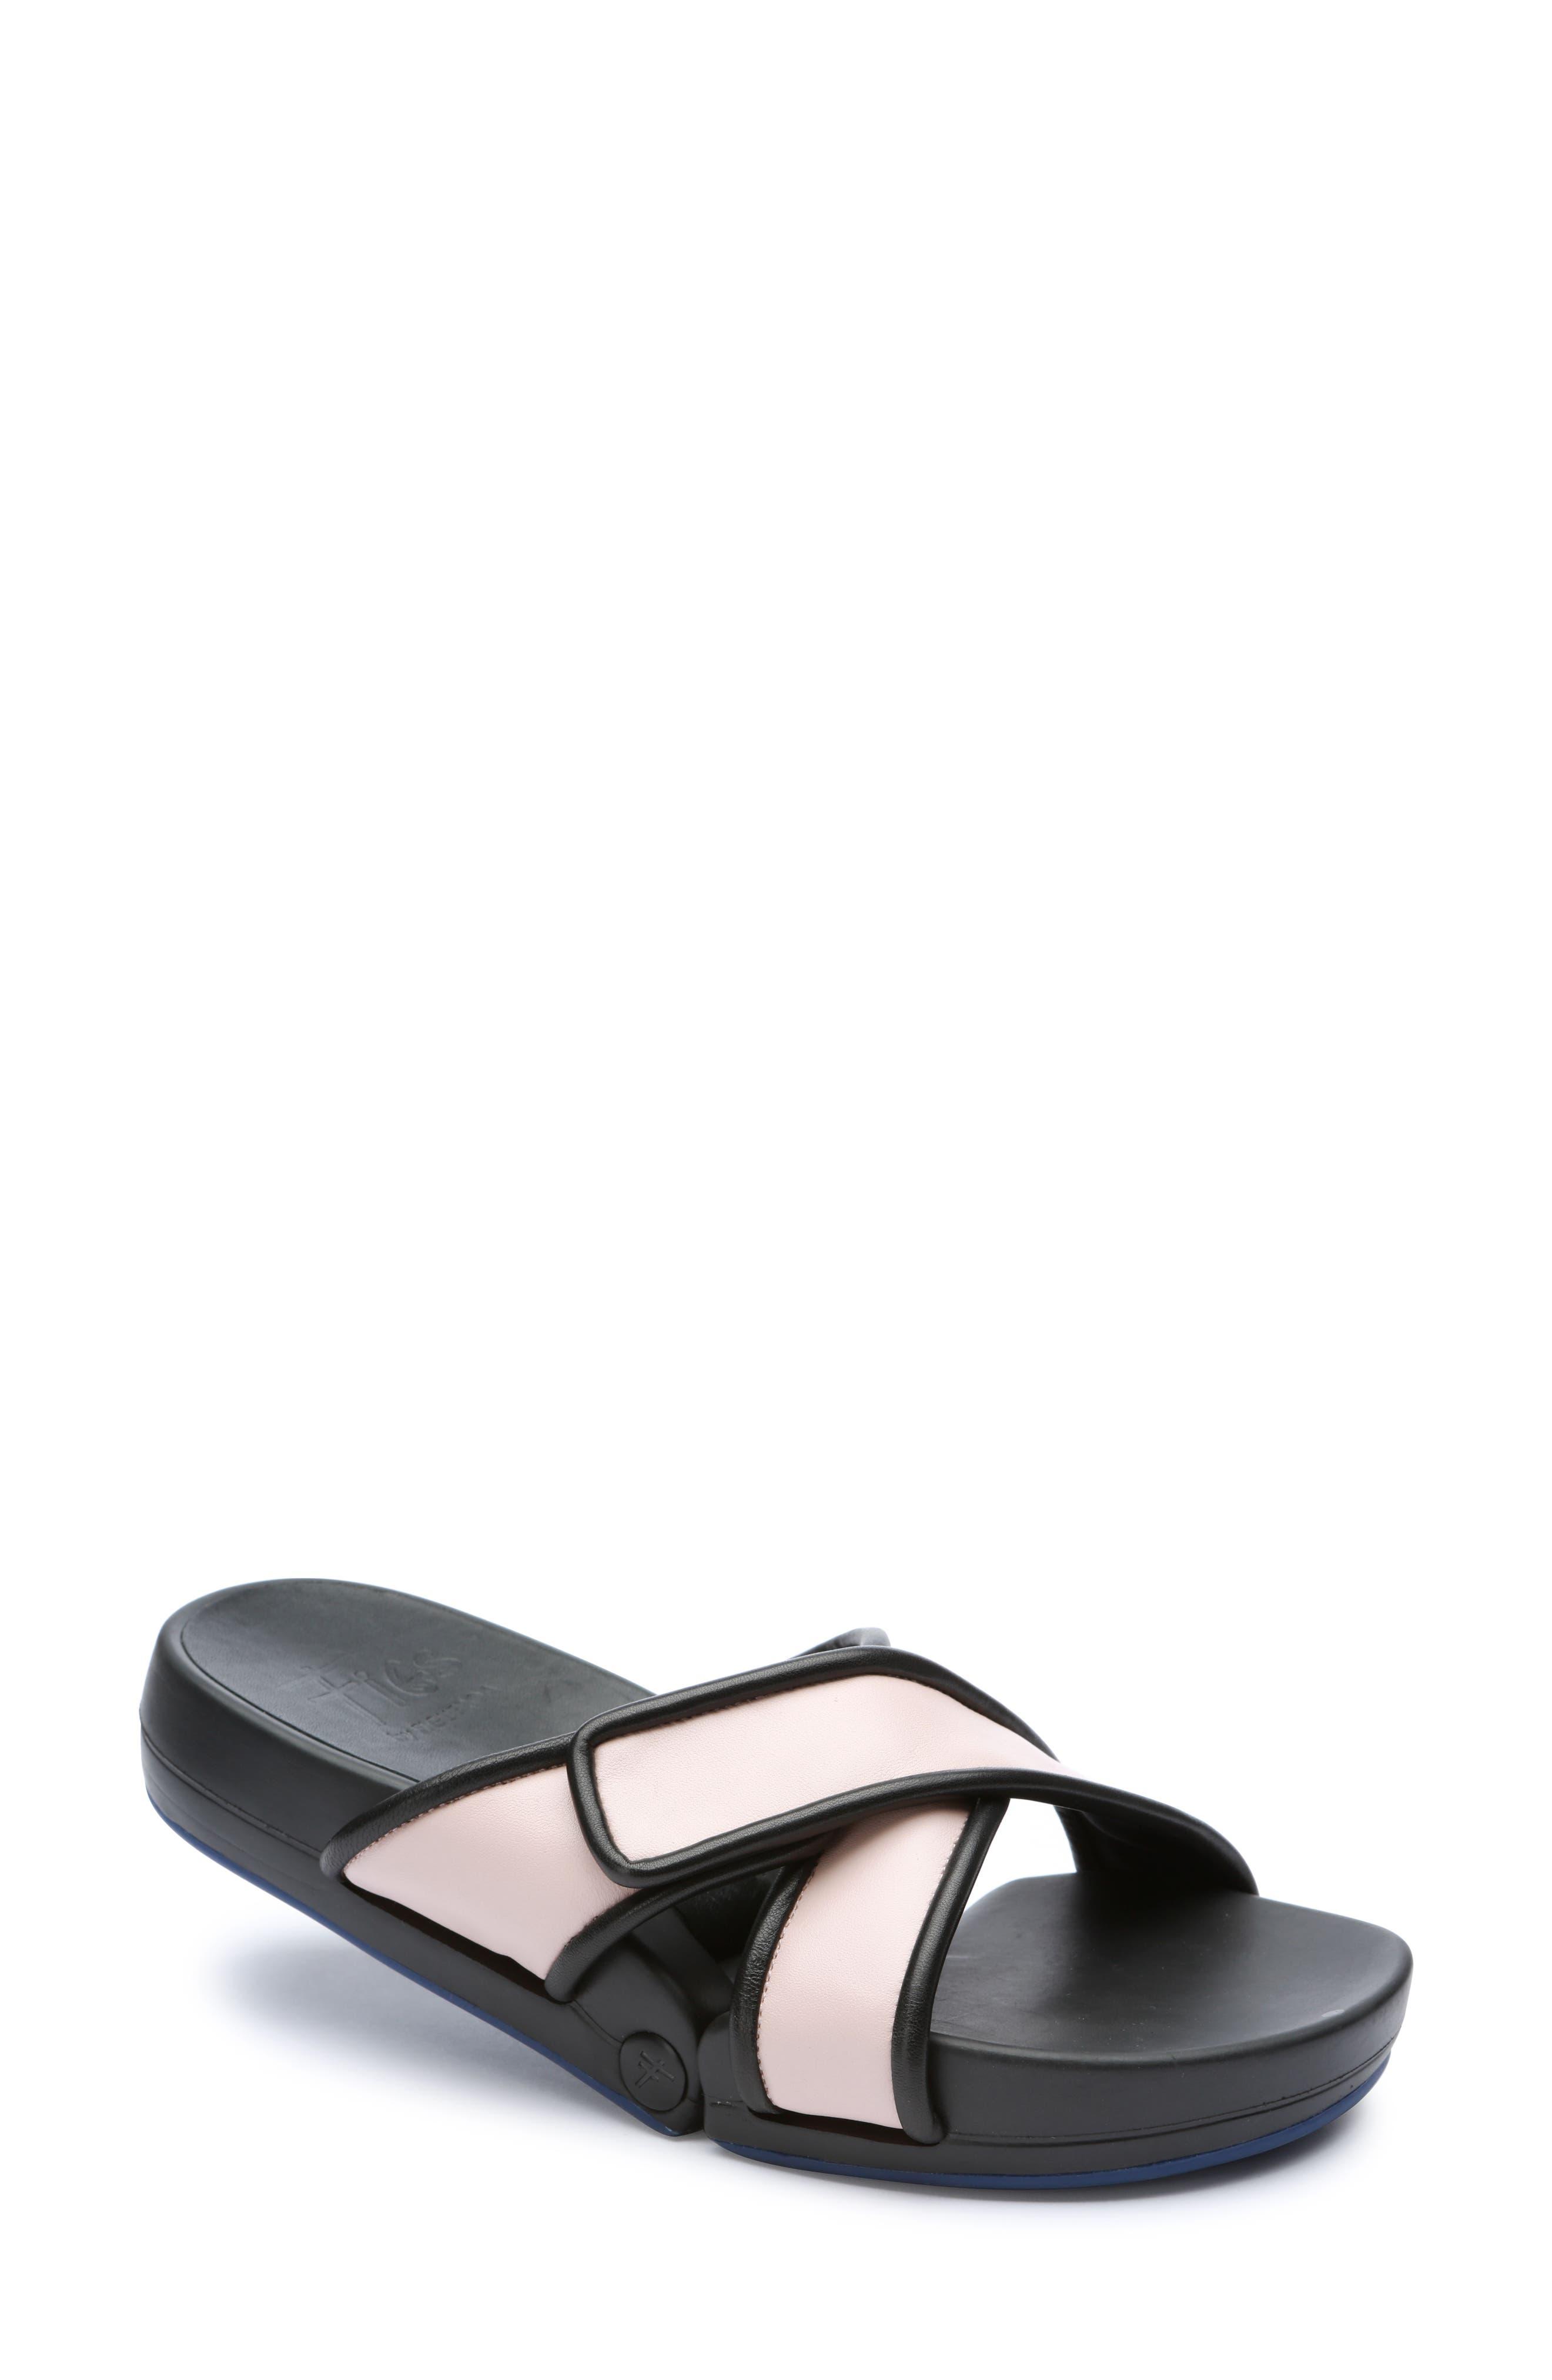 Figomatic Slide Sandal,                         Main,                         color, Pink Nappa Leather